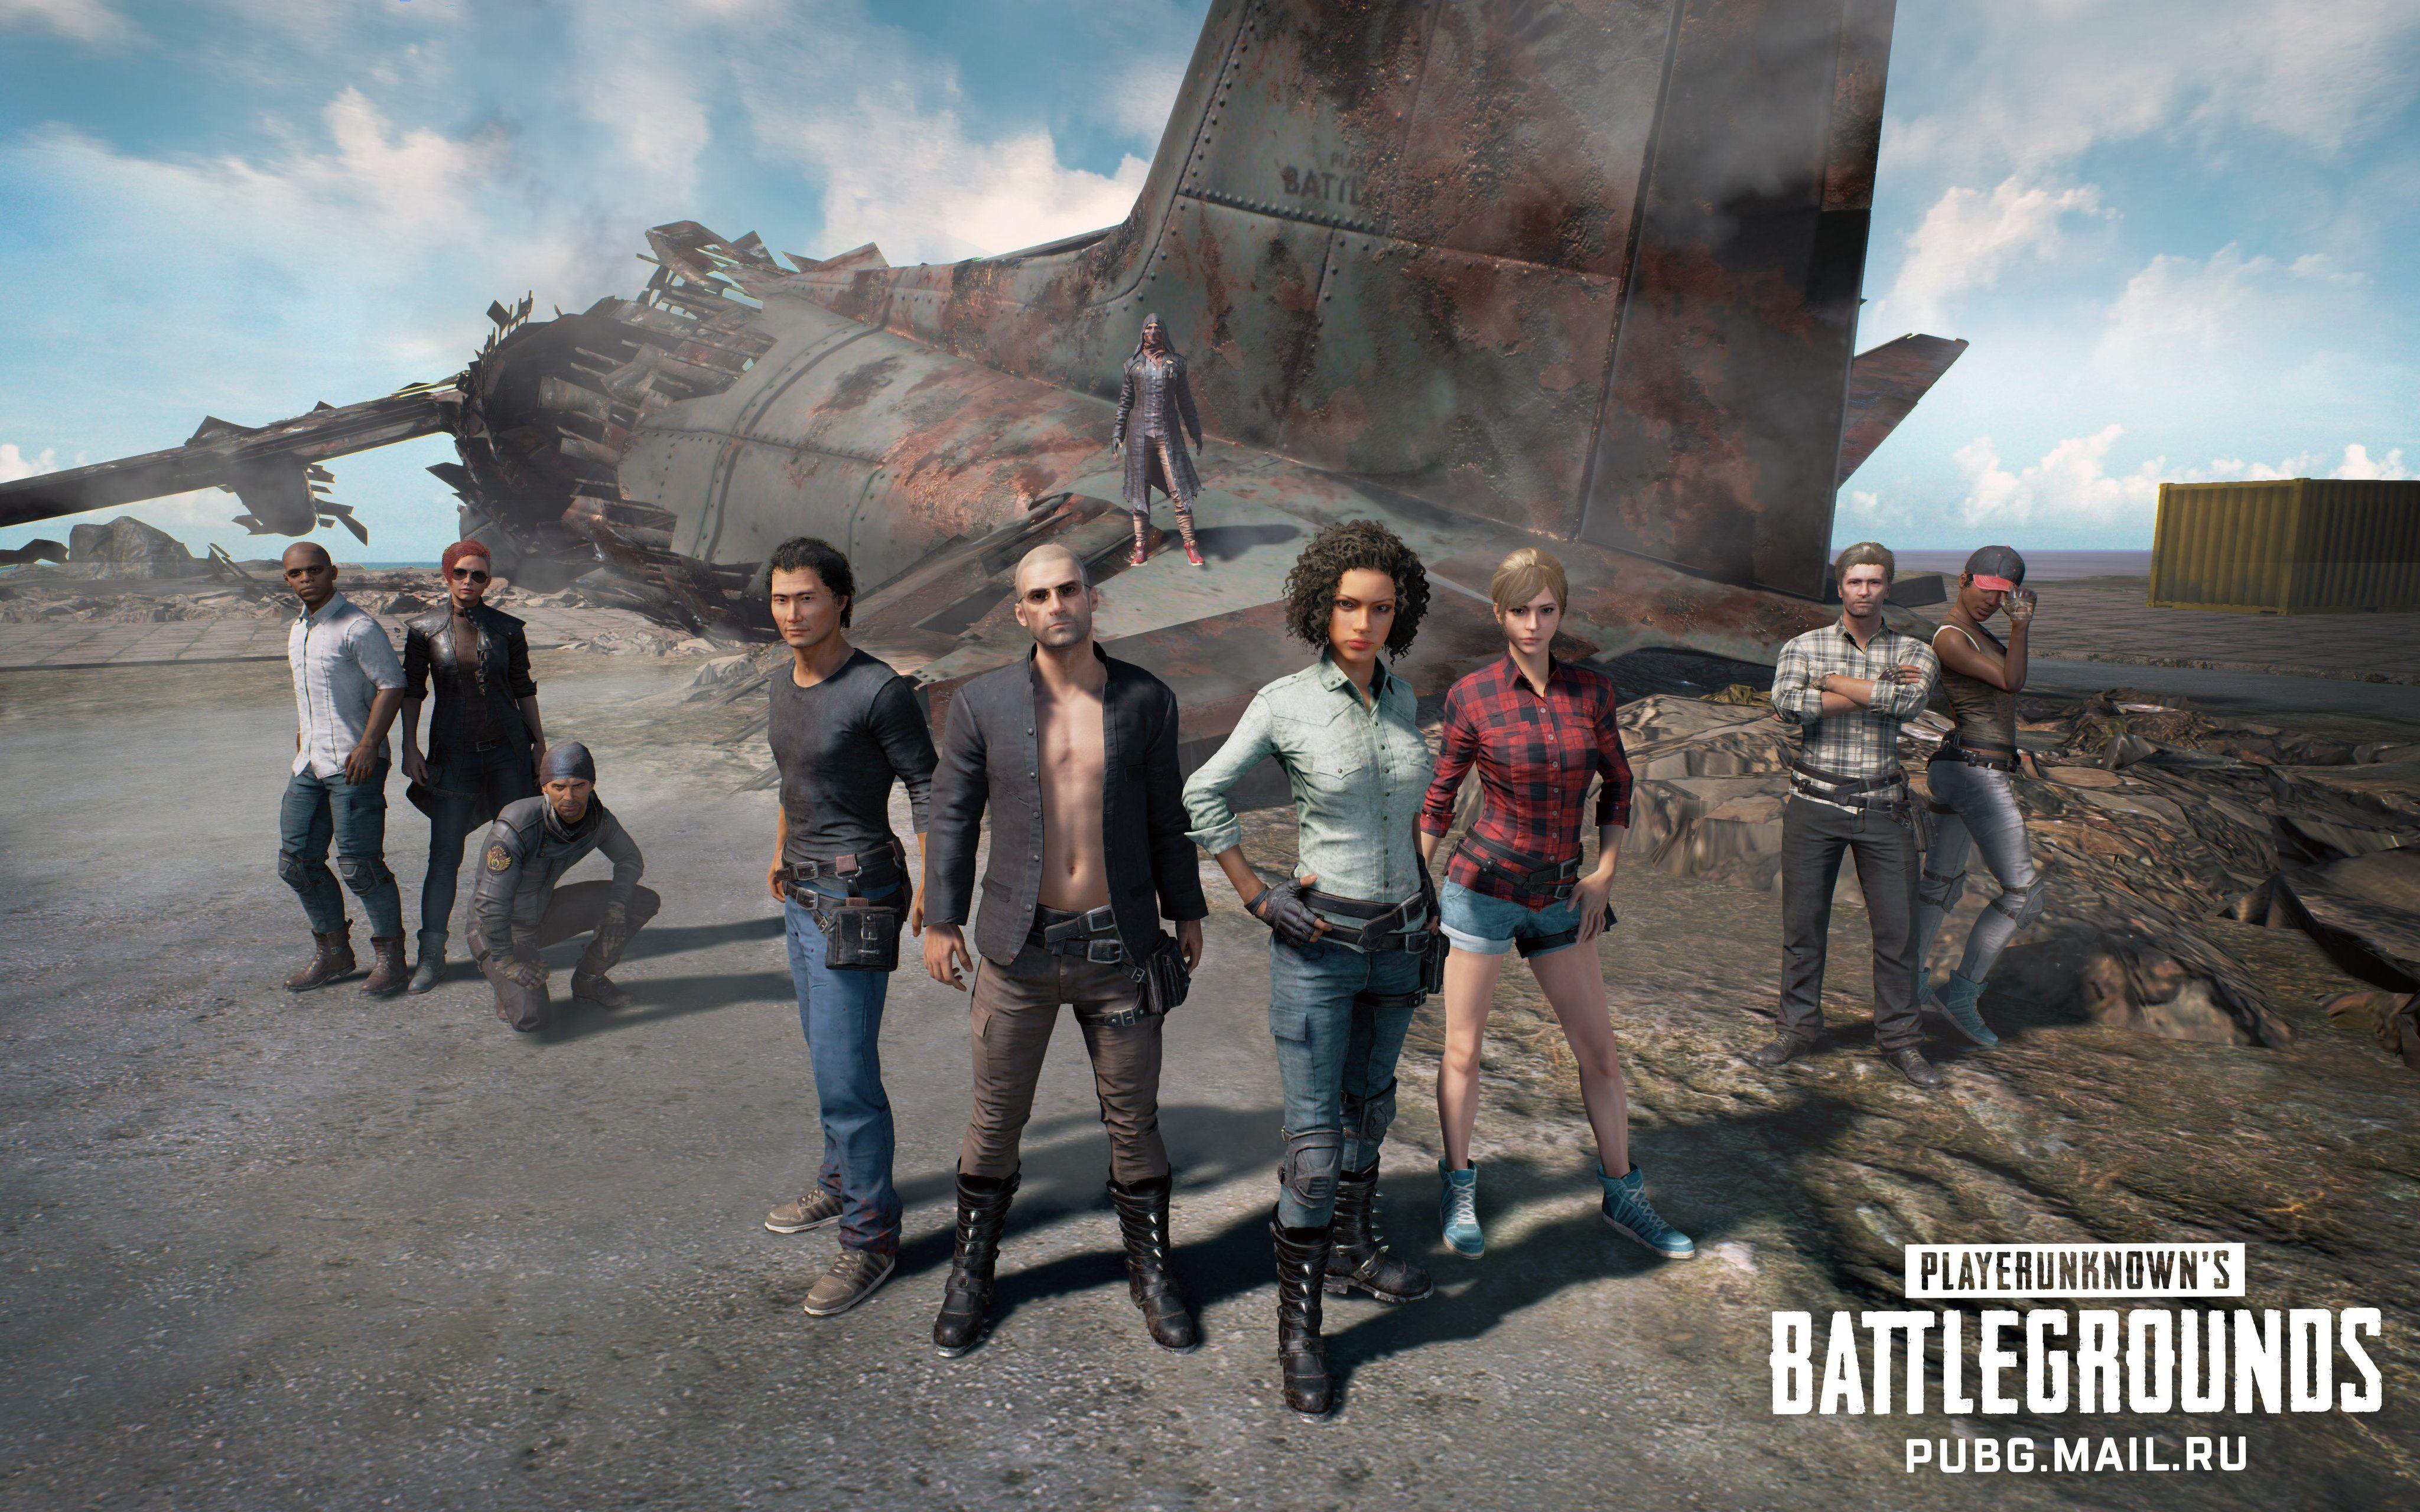 PlayerUnknowns Battlegrounds PUBG Wallpapers and Photos 4096x2560